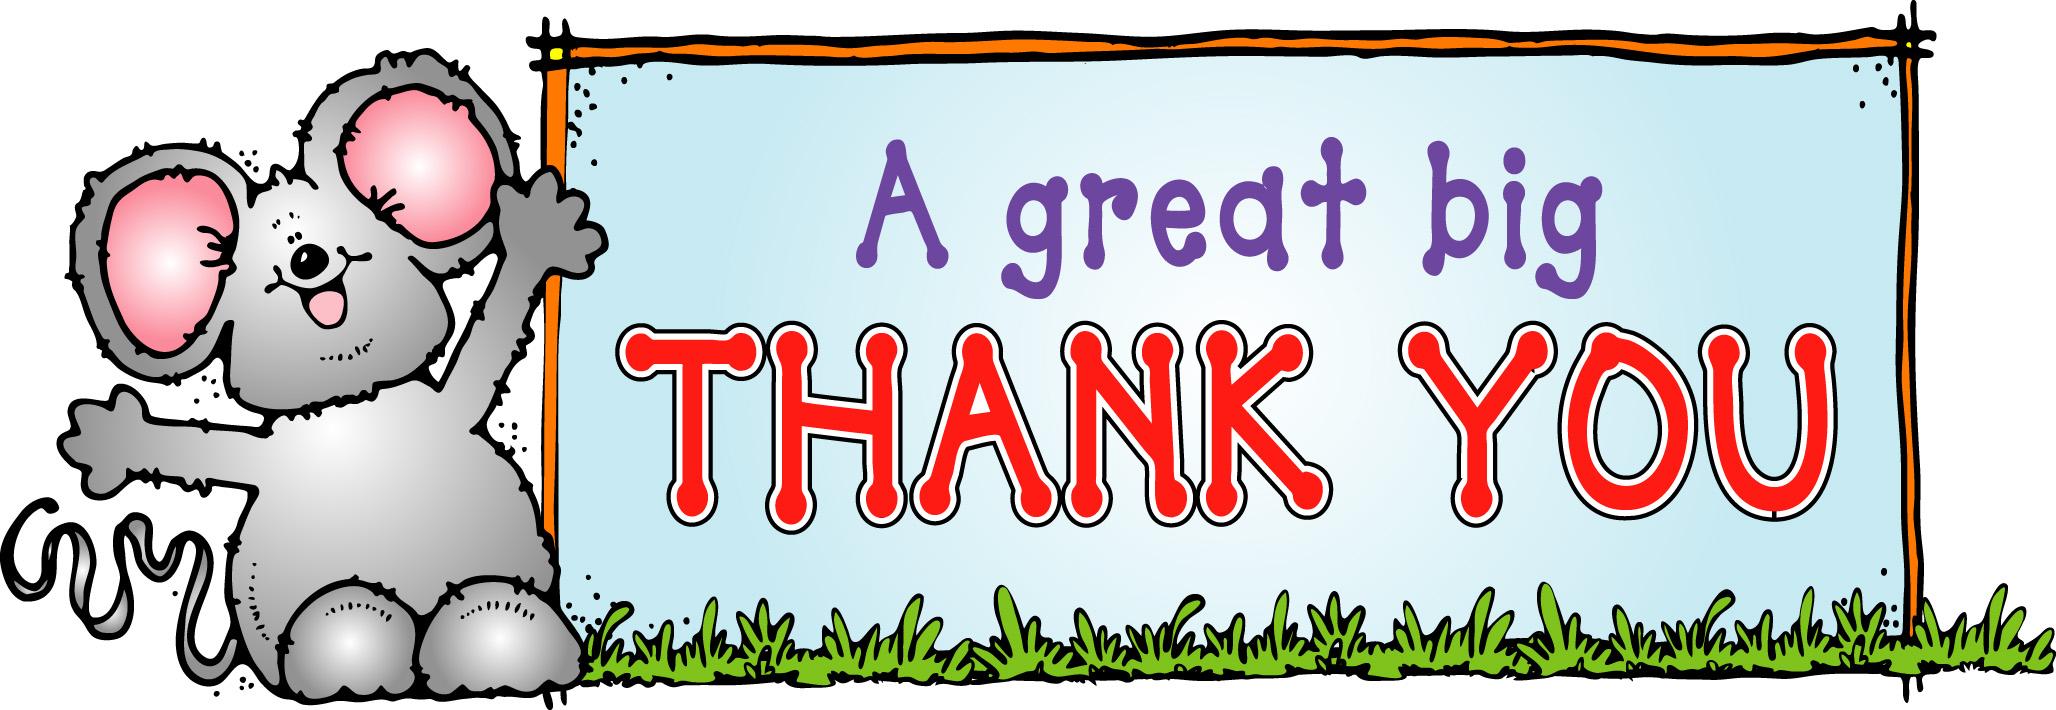 2056x710 Smartness Inspiration Thank You Clipart 48 Best Thank You Clip Art